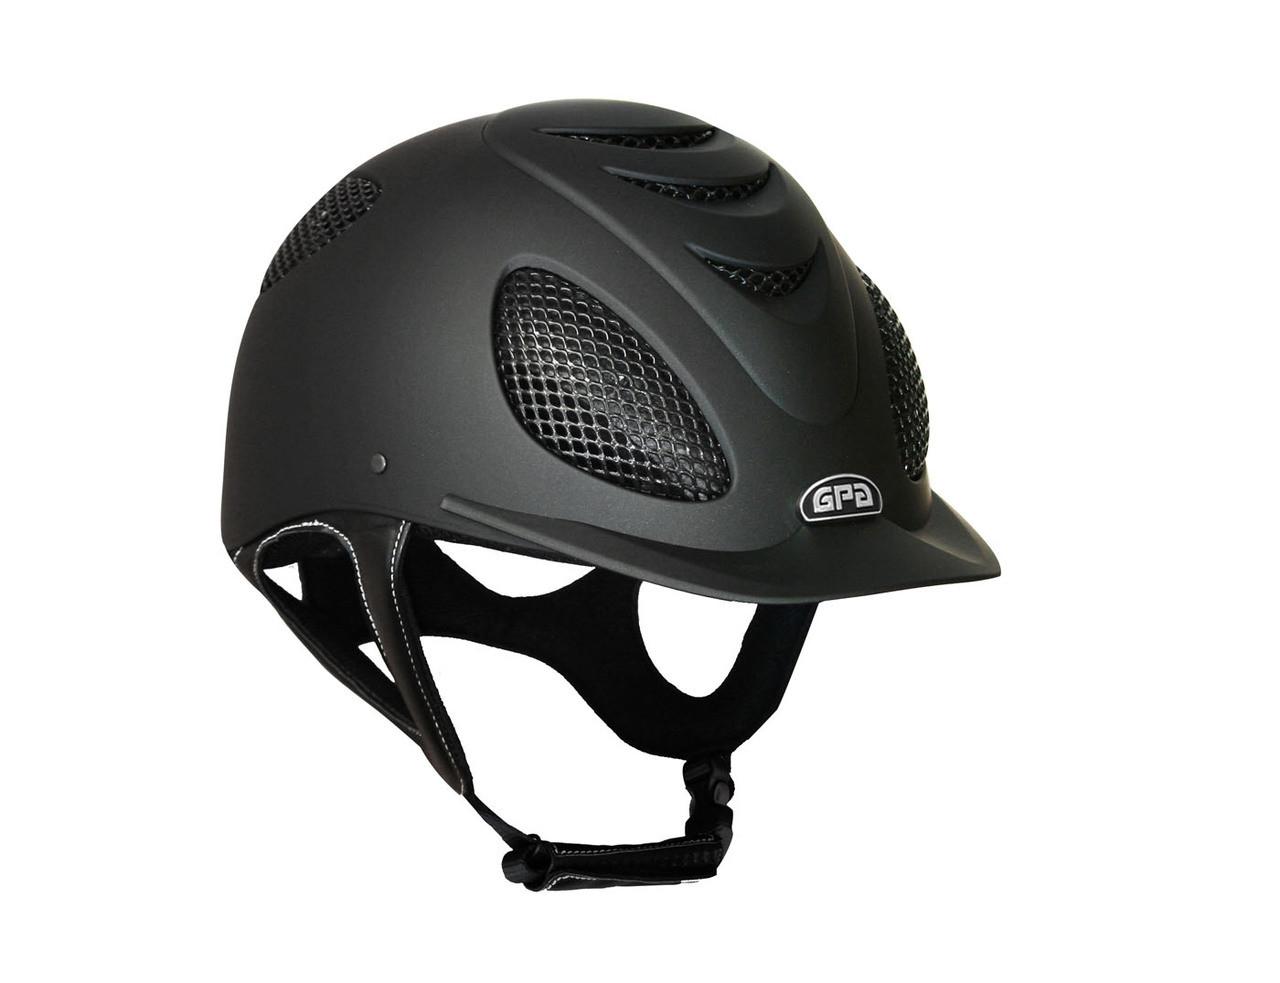 Gpa Speed Air 2x Helmet - Riding Helmets & Gear